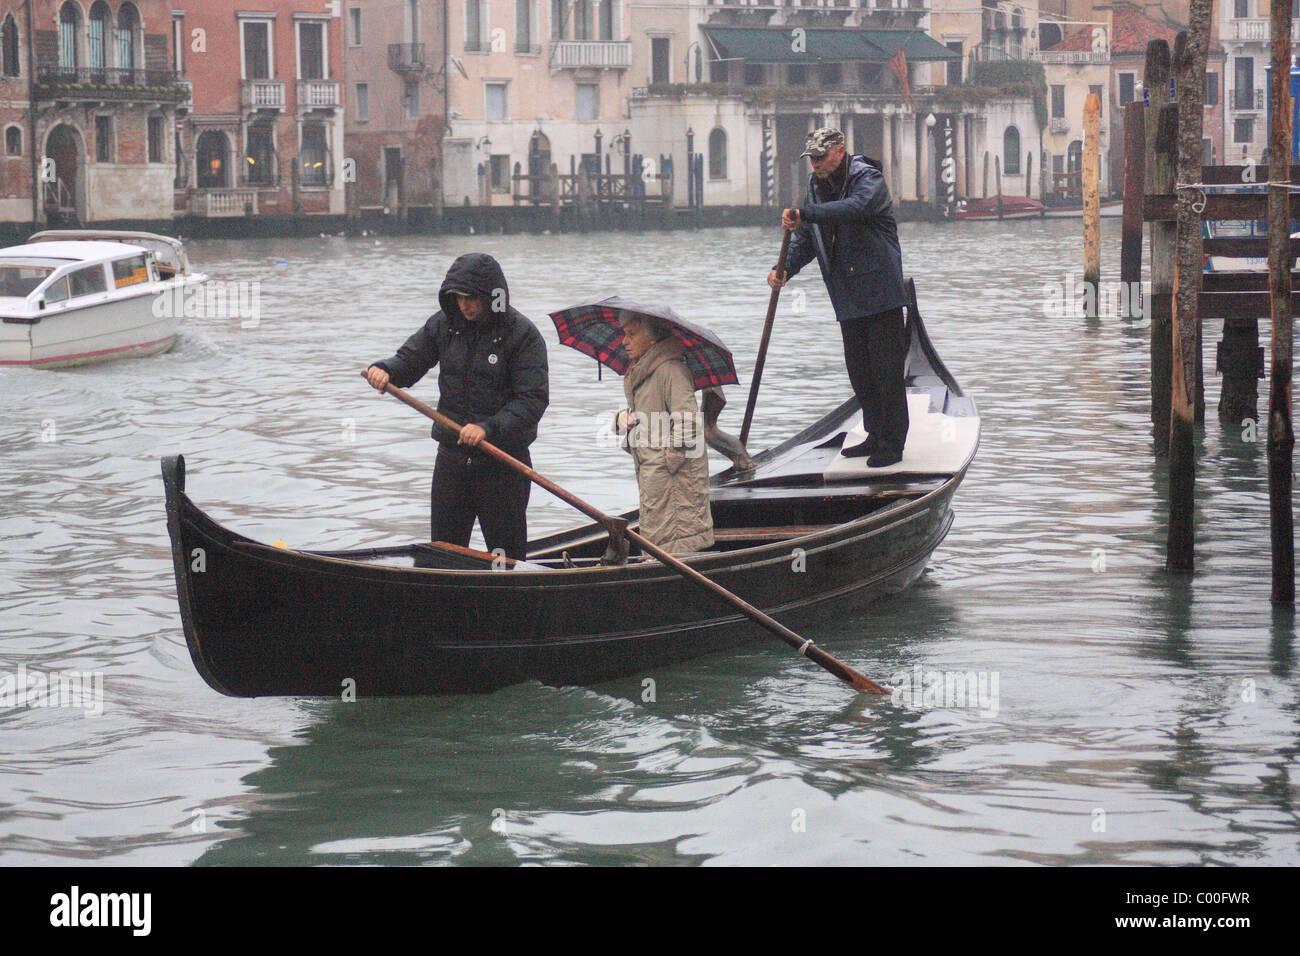 Traghetto (ferry gondola) crossing the Grand Canal, Venice - Stock Image